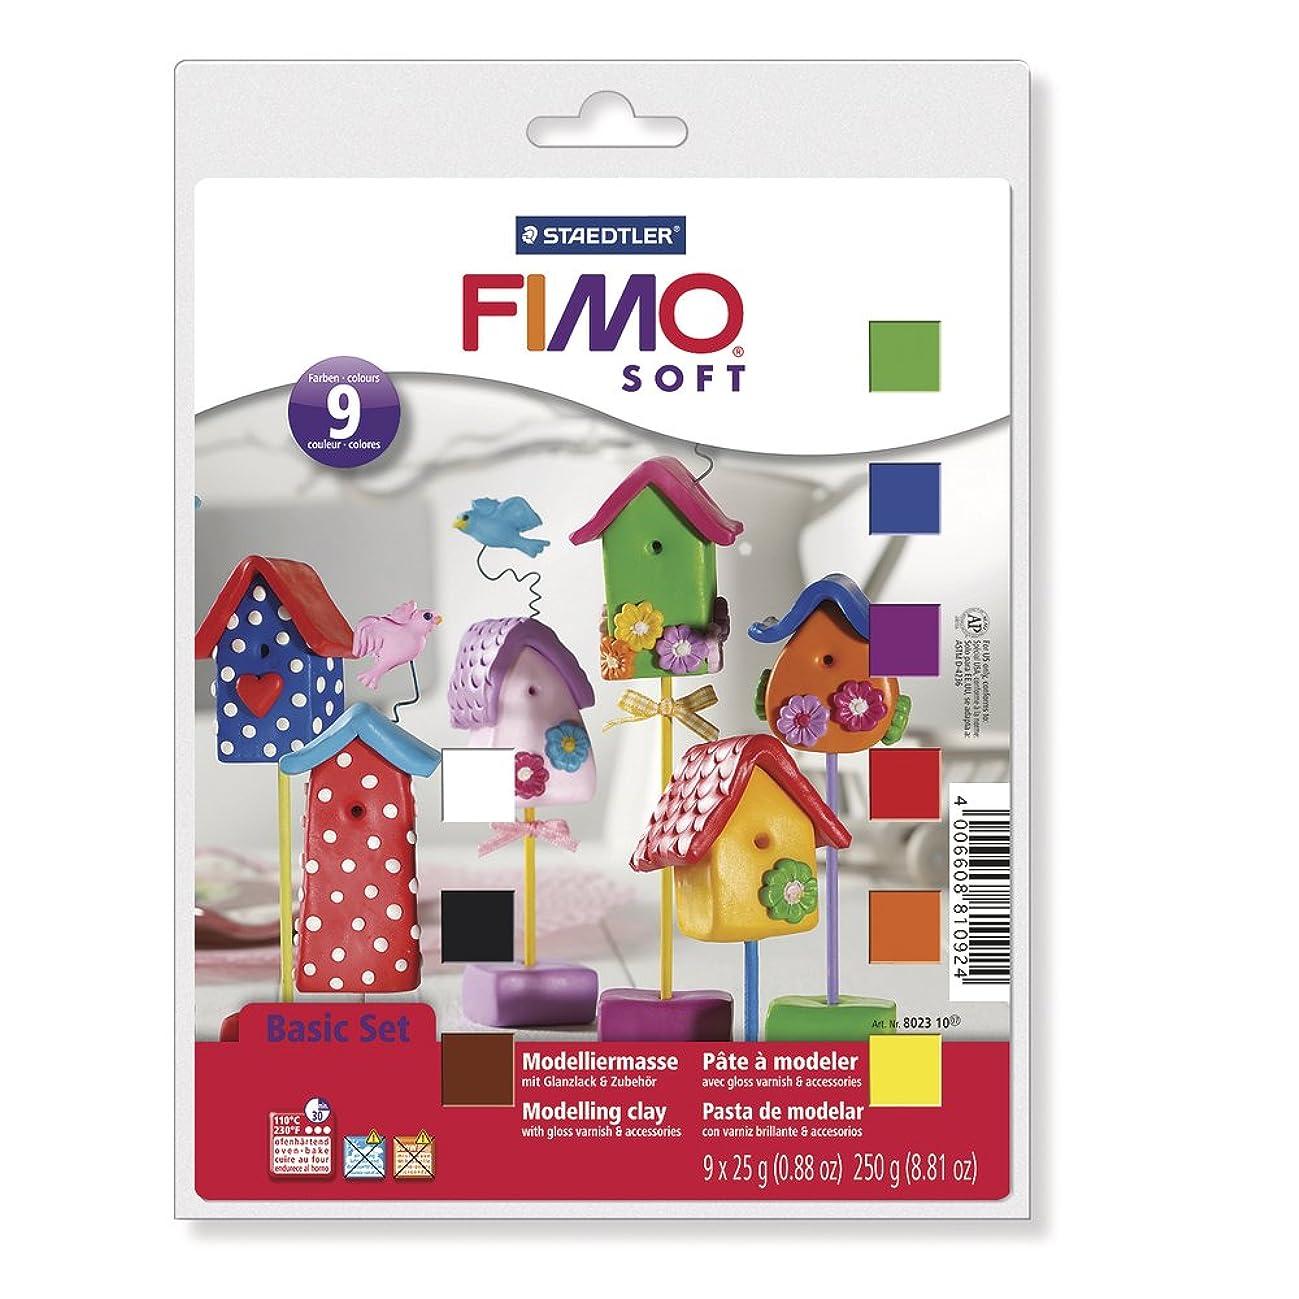 Staedtler FIMO Soft 8023 Material Pack